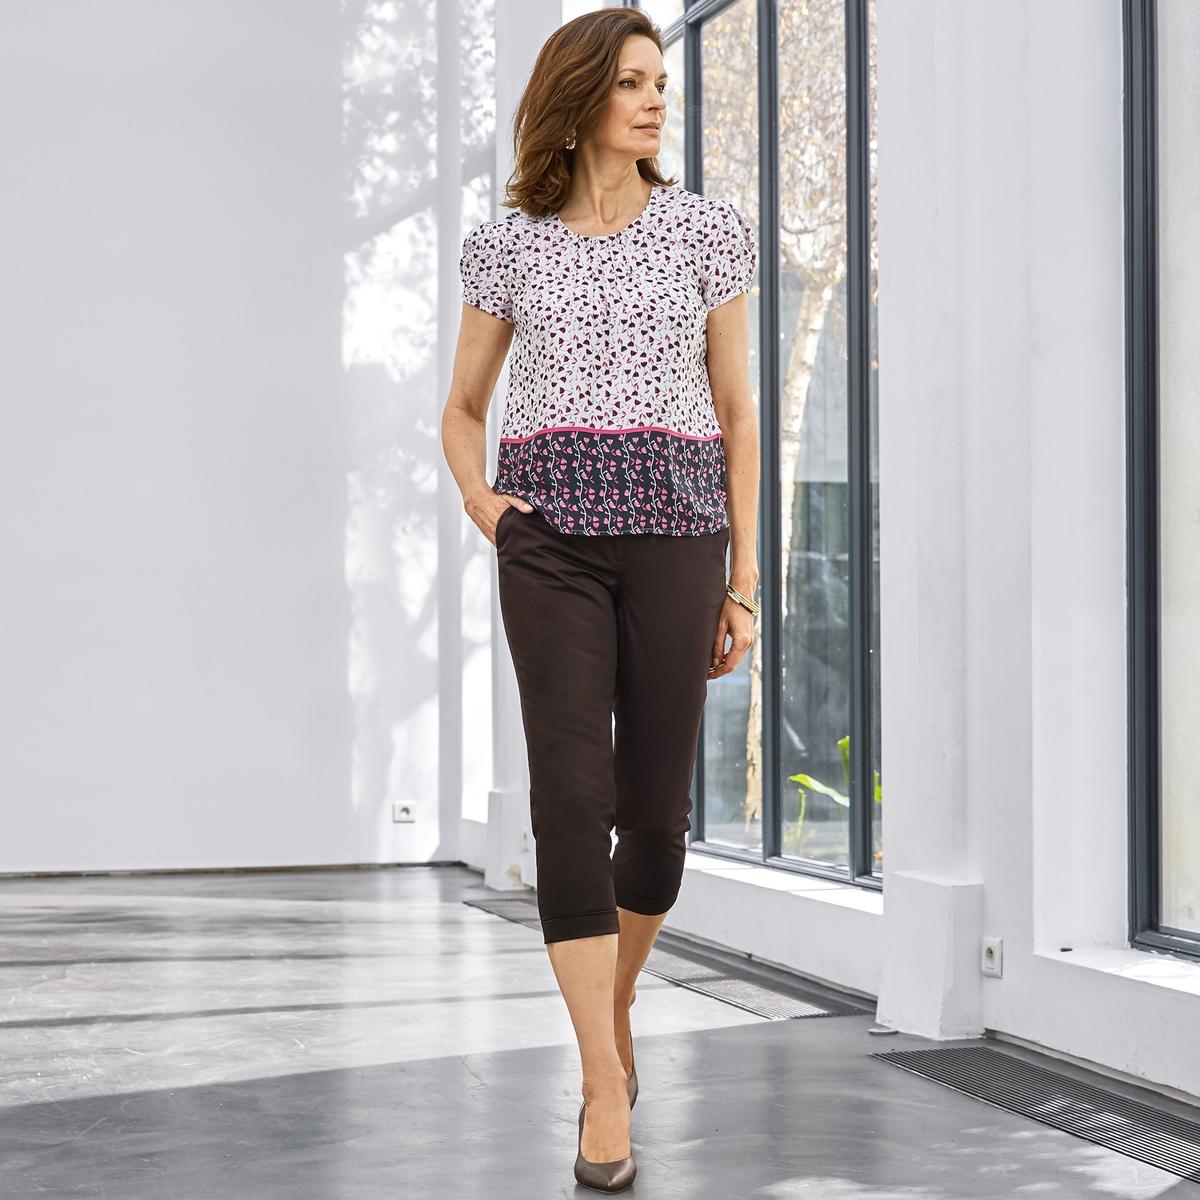 Imagen adicional de producto de Pantalón pesquero, satén de algodón stretch - Anne weyburn